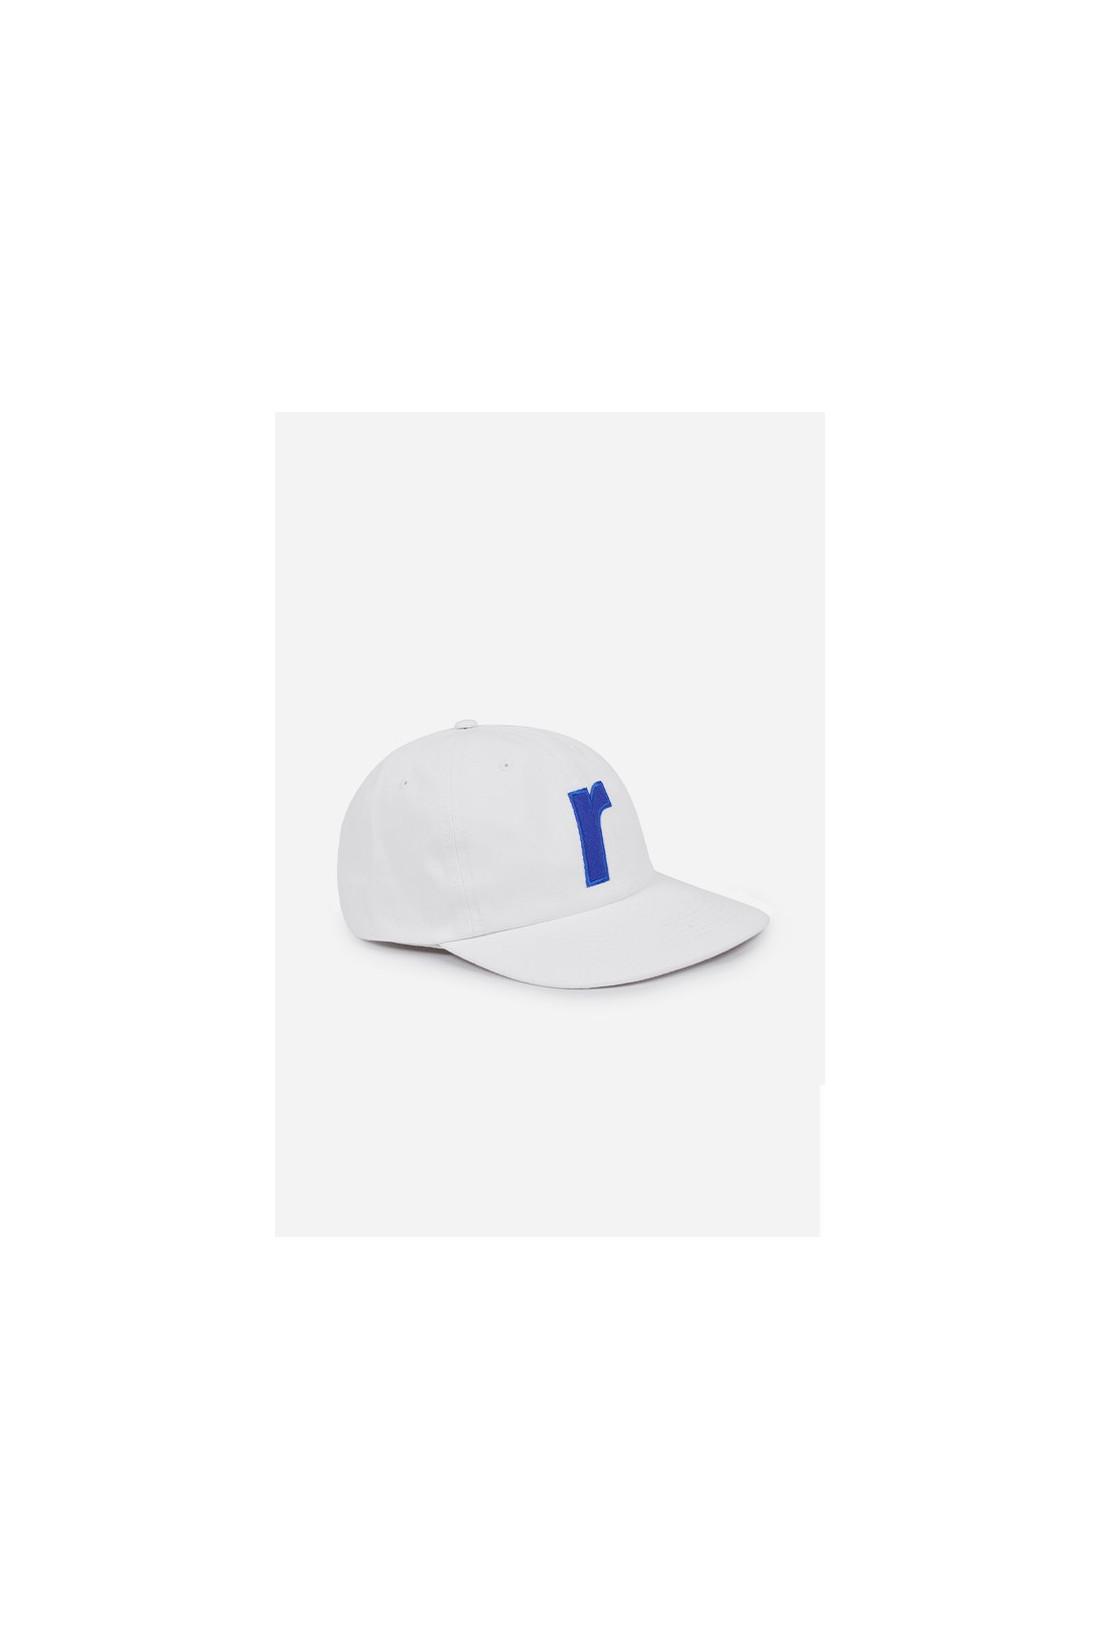 RAVE / R logo cap White